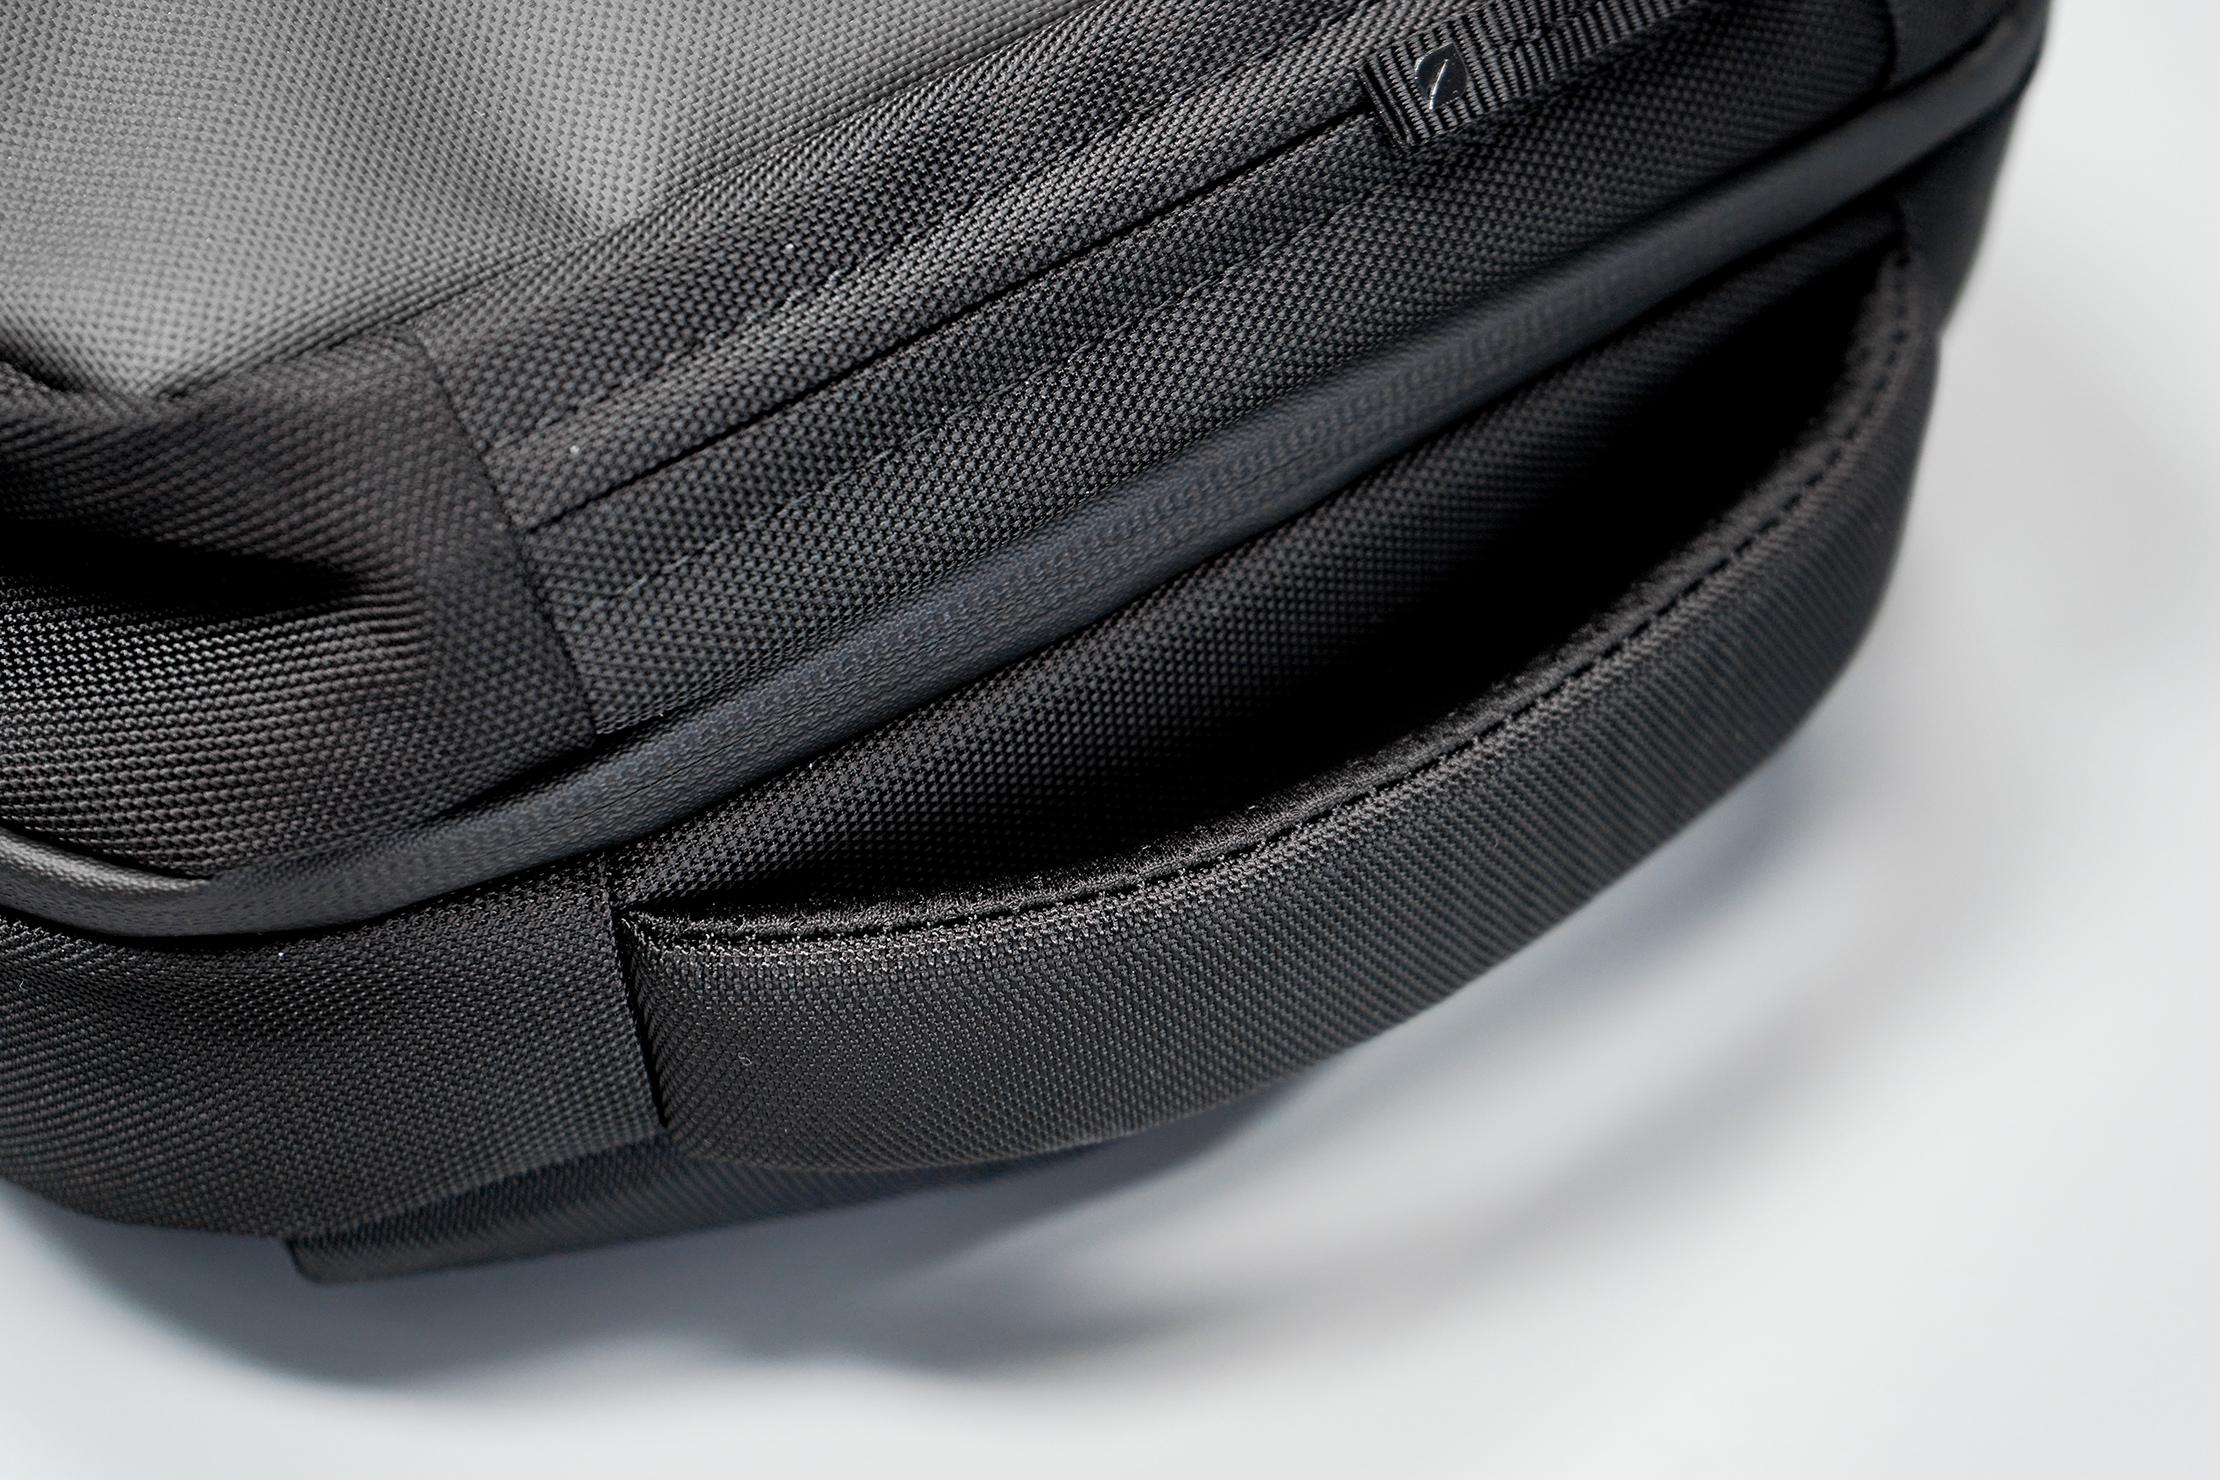 Incase ICON Lite Triple Black Backpack Handle